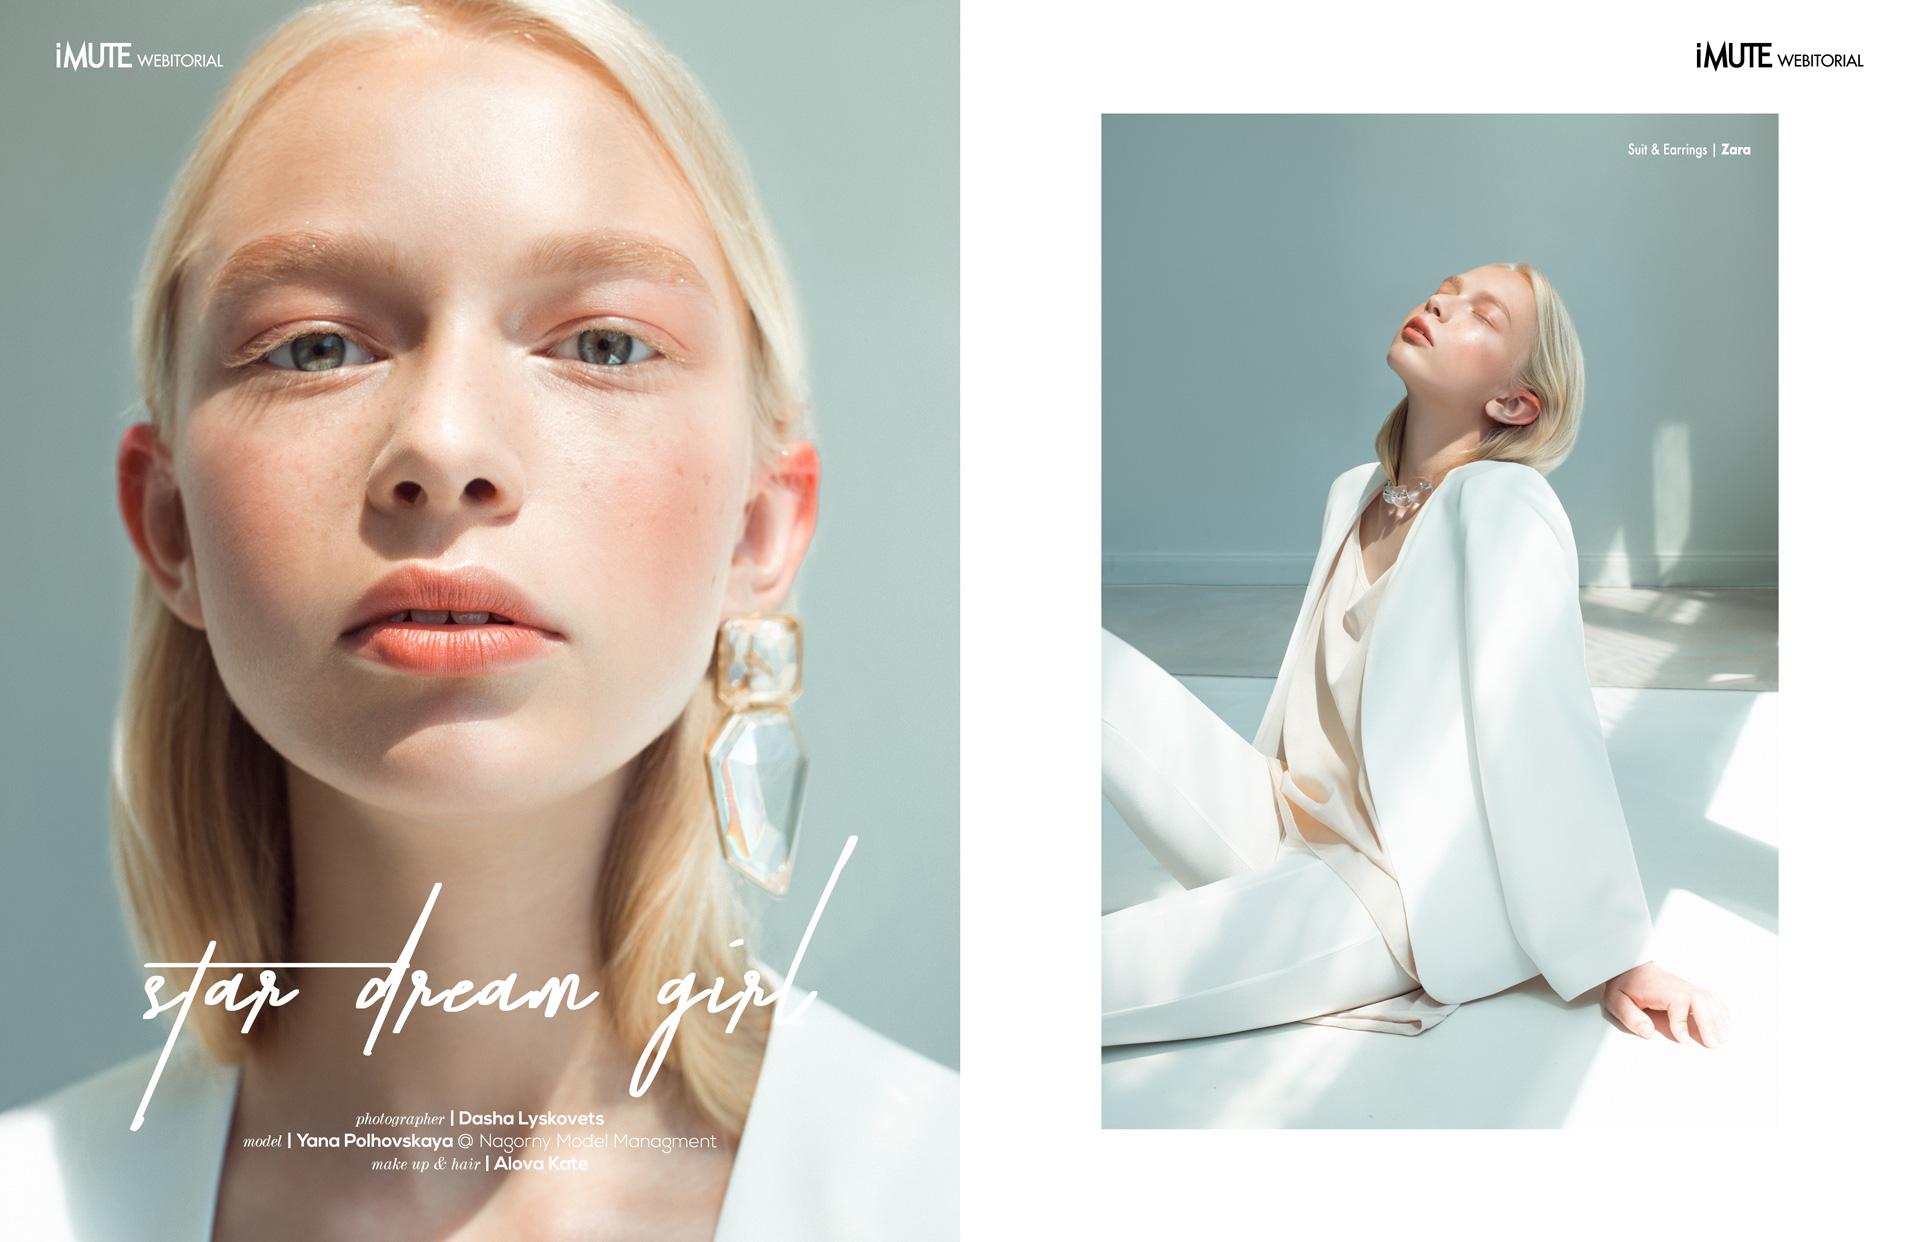 Star dream girl webitorial for iMute Magazine Photographer|Dasha Lyskovets Model| Yana Polhovskaya @Nagorny Models Makeup & Hair|Alova Kate